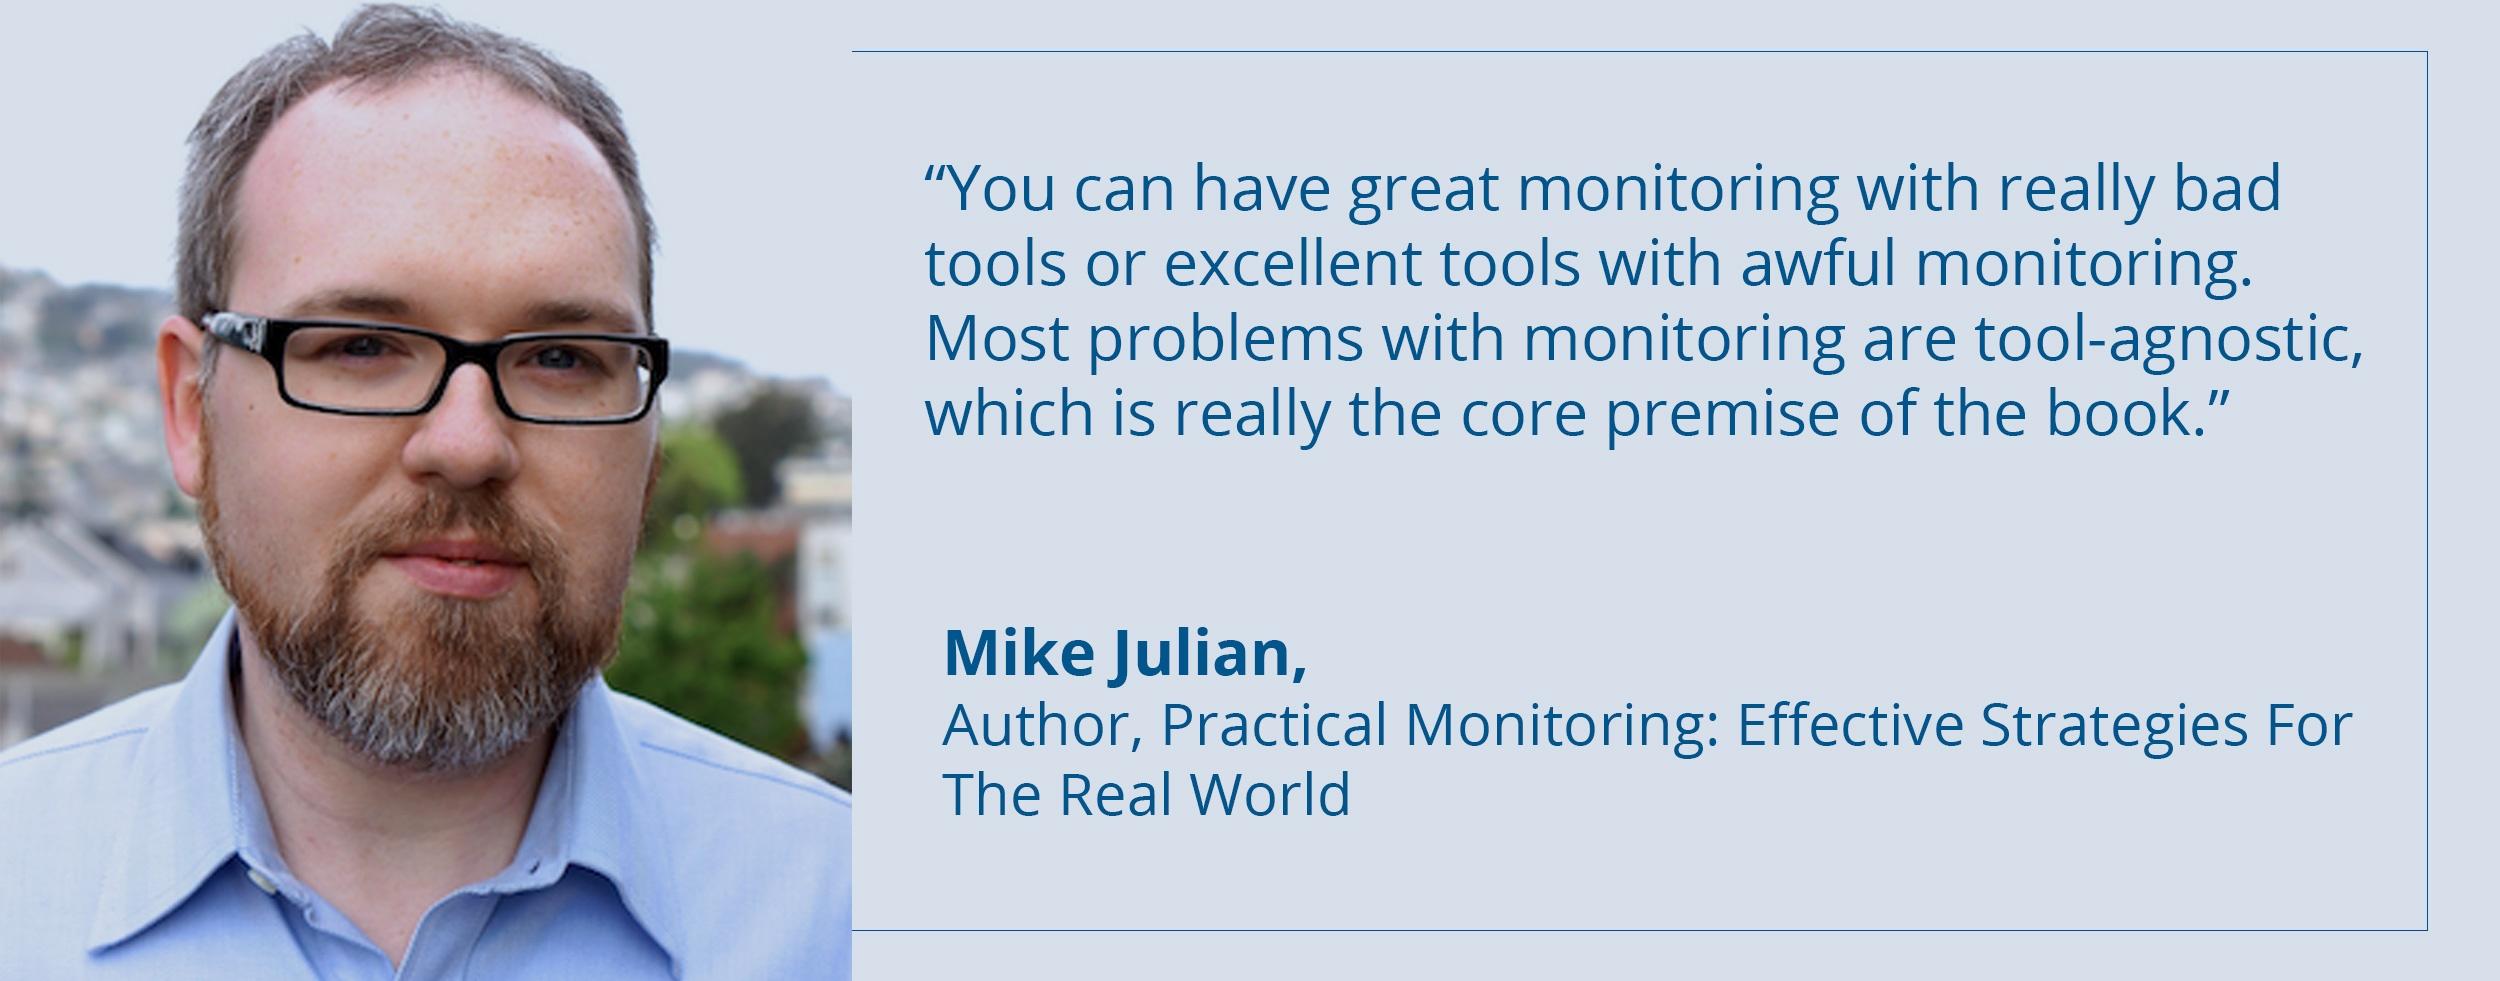 Mike Julian On Practical Monitoring